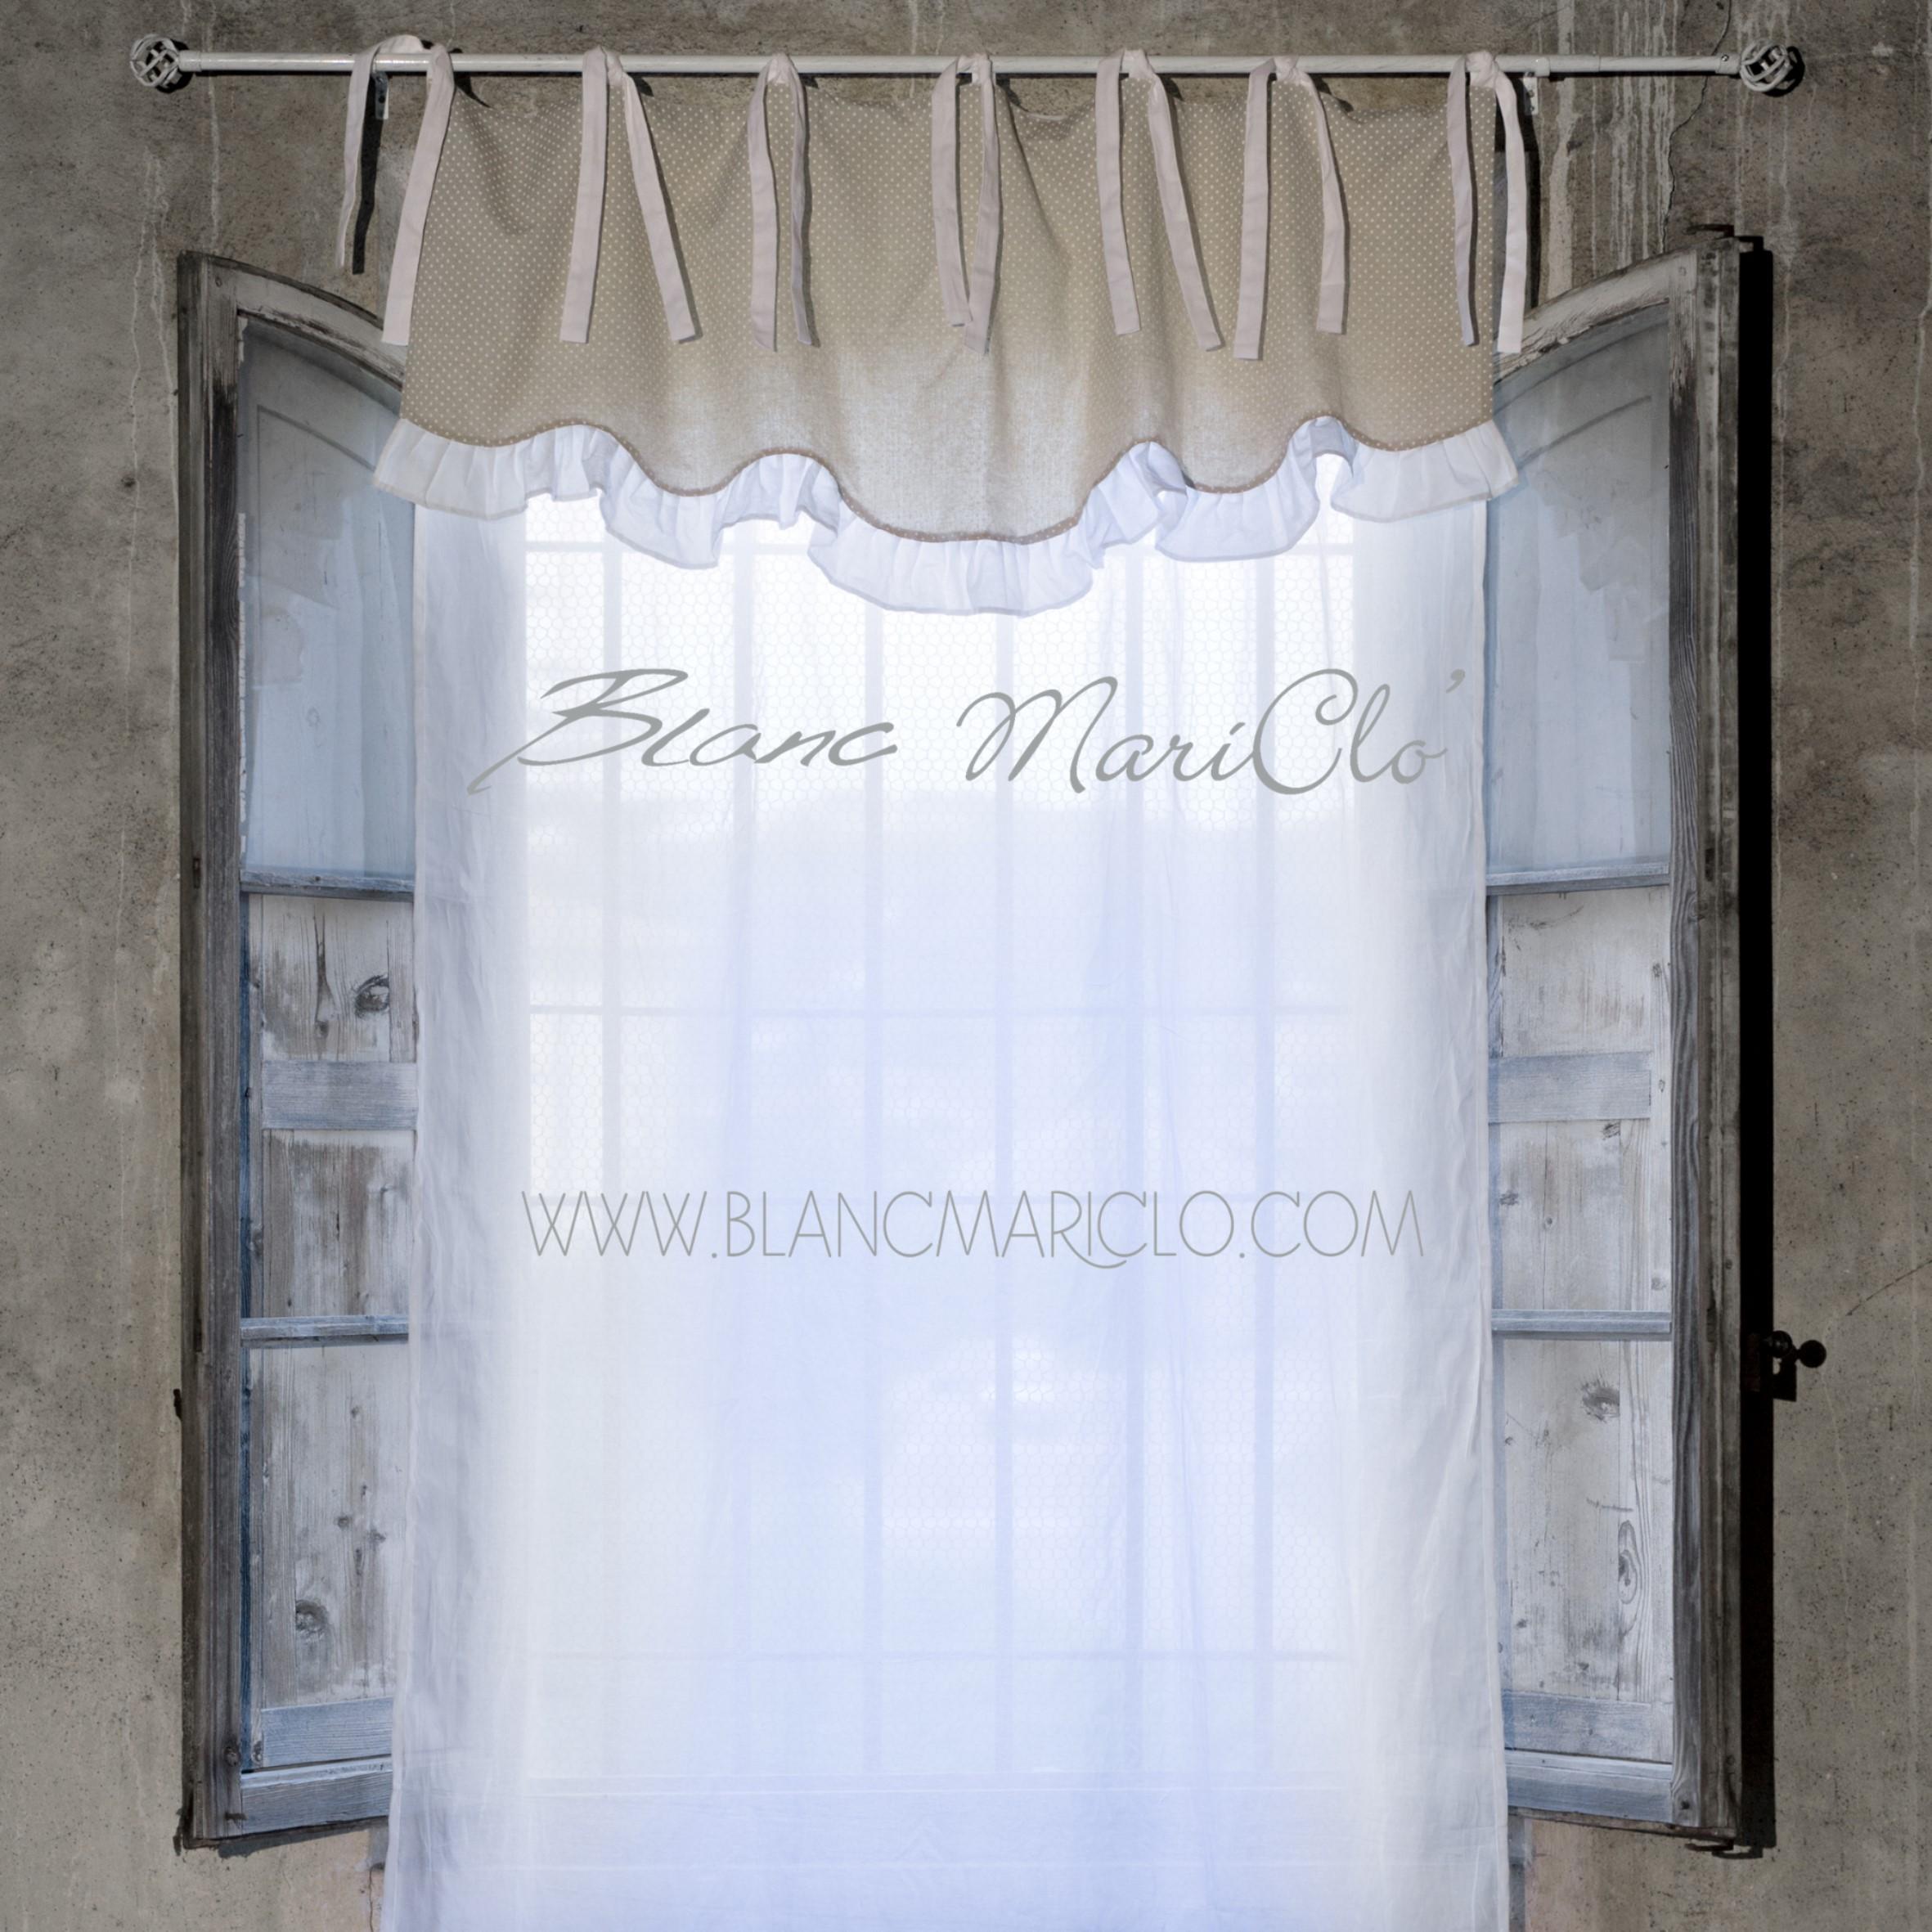 Shabby Shop Online   Blanc Mariclo Follie Shop Online Shabby Chic